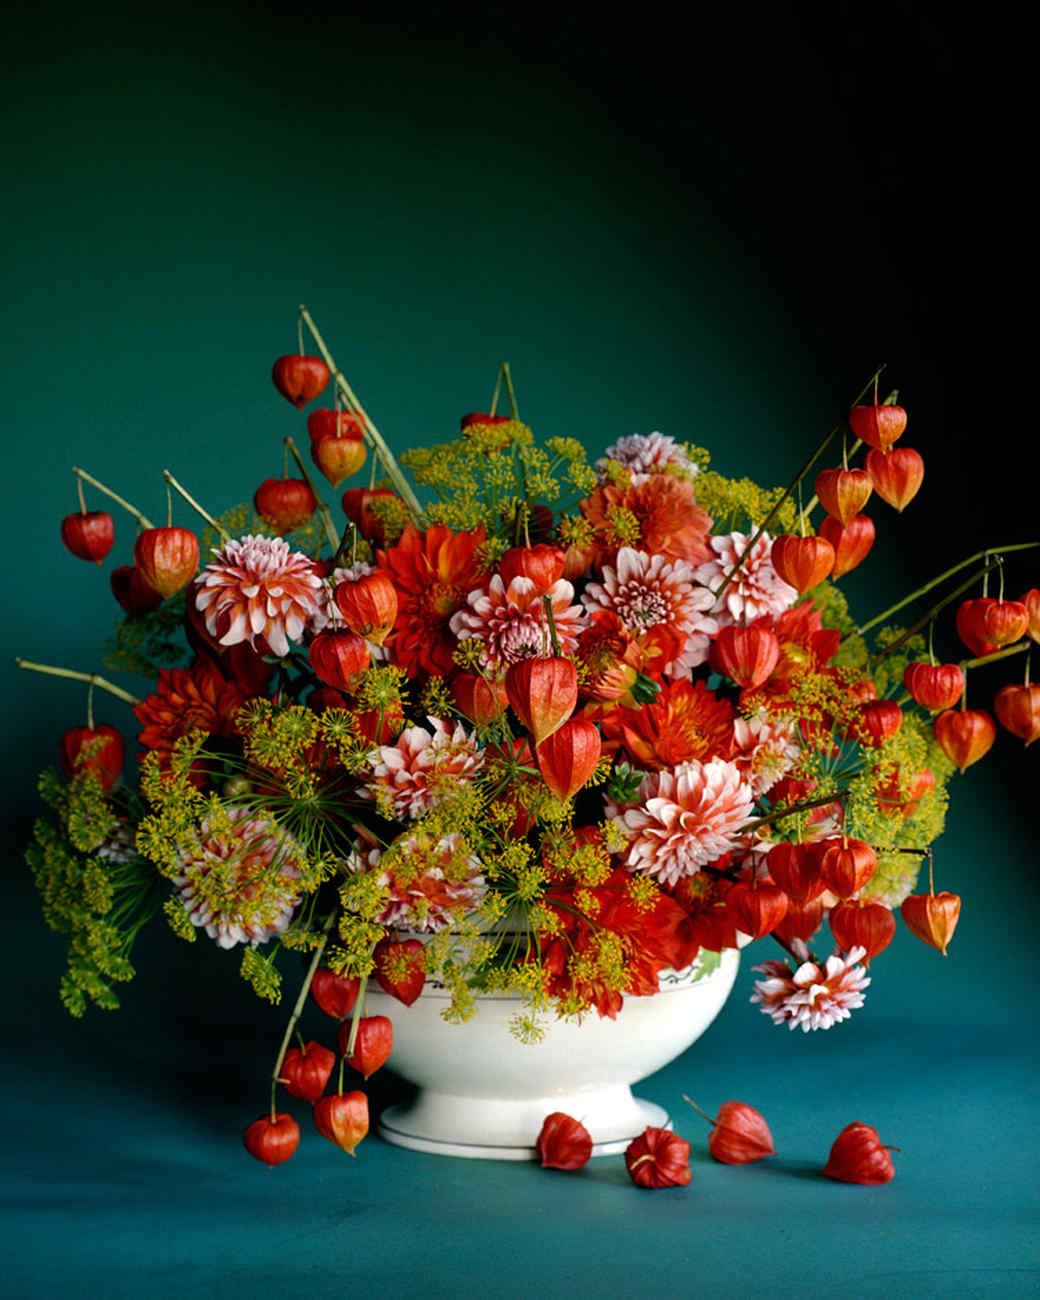 flower-arranging-la105319-09-08-09-17.jpg